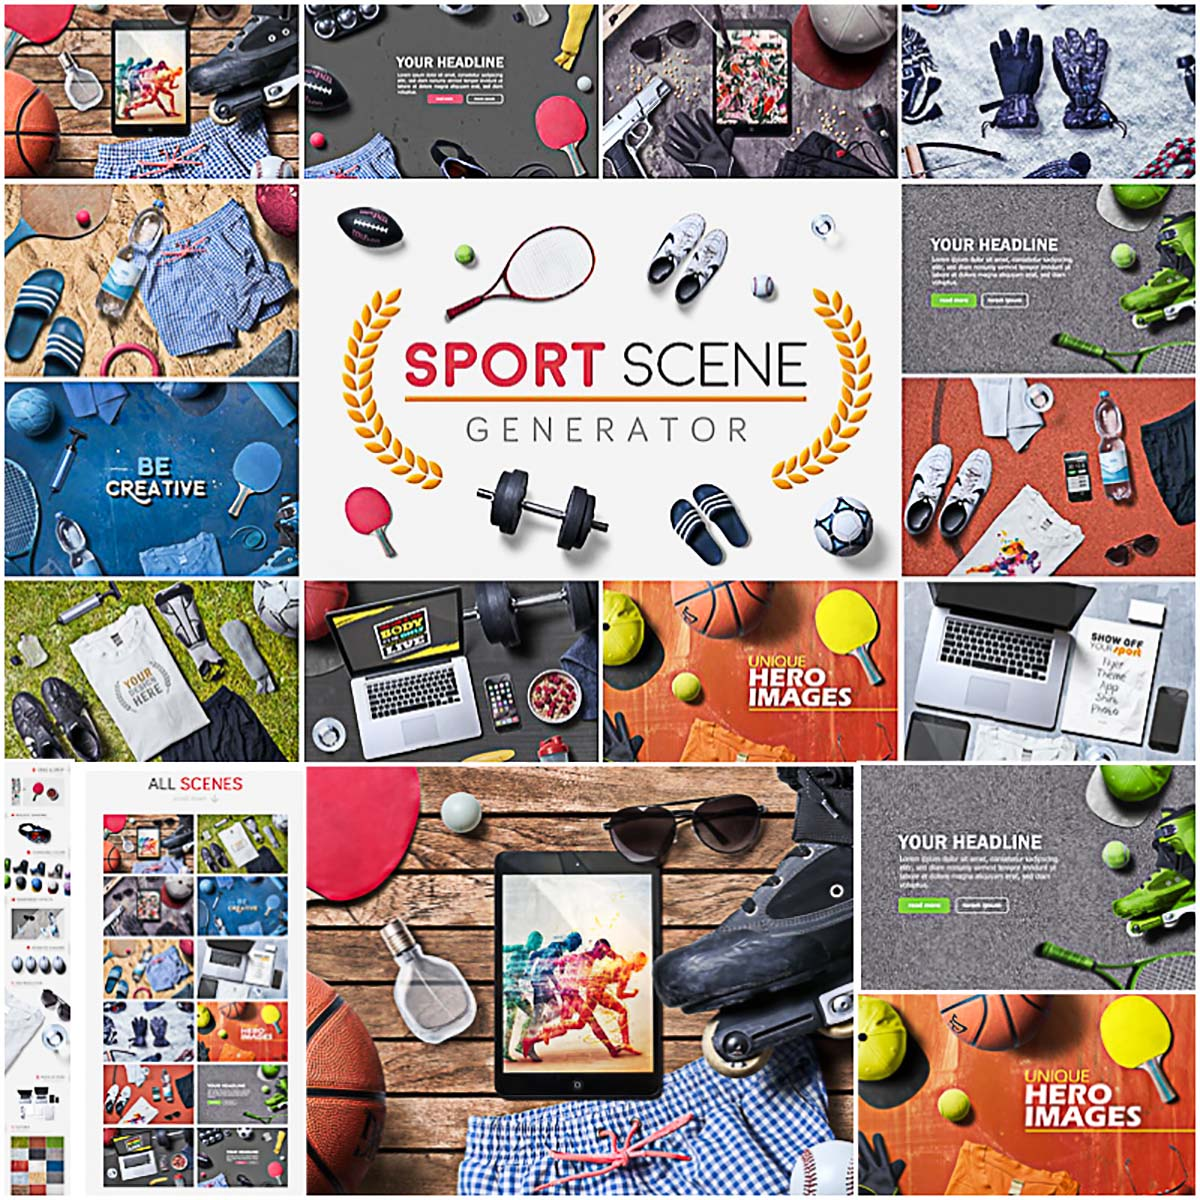 Sport scene creator